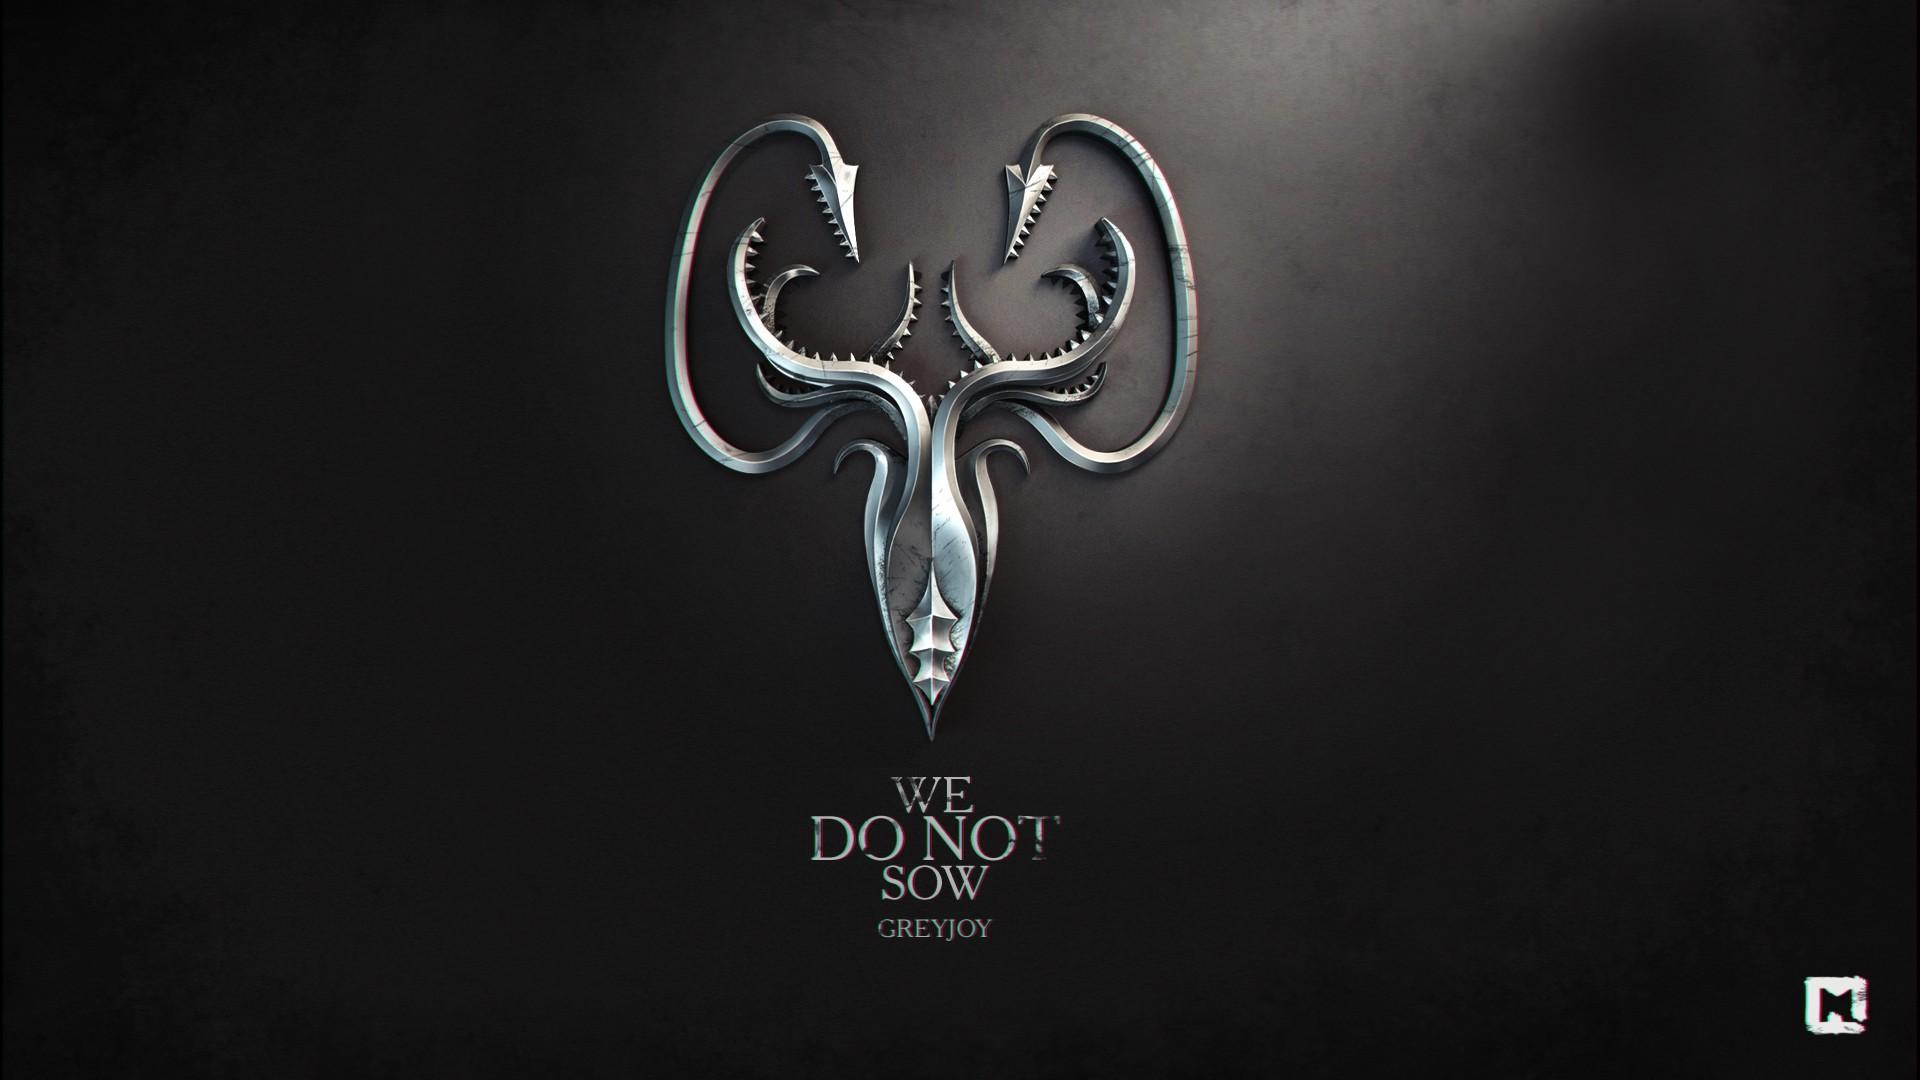 50 Game Of Thrones Wallpaper 1080p On Wallpapersafari